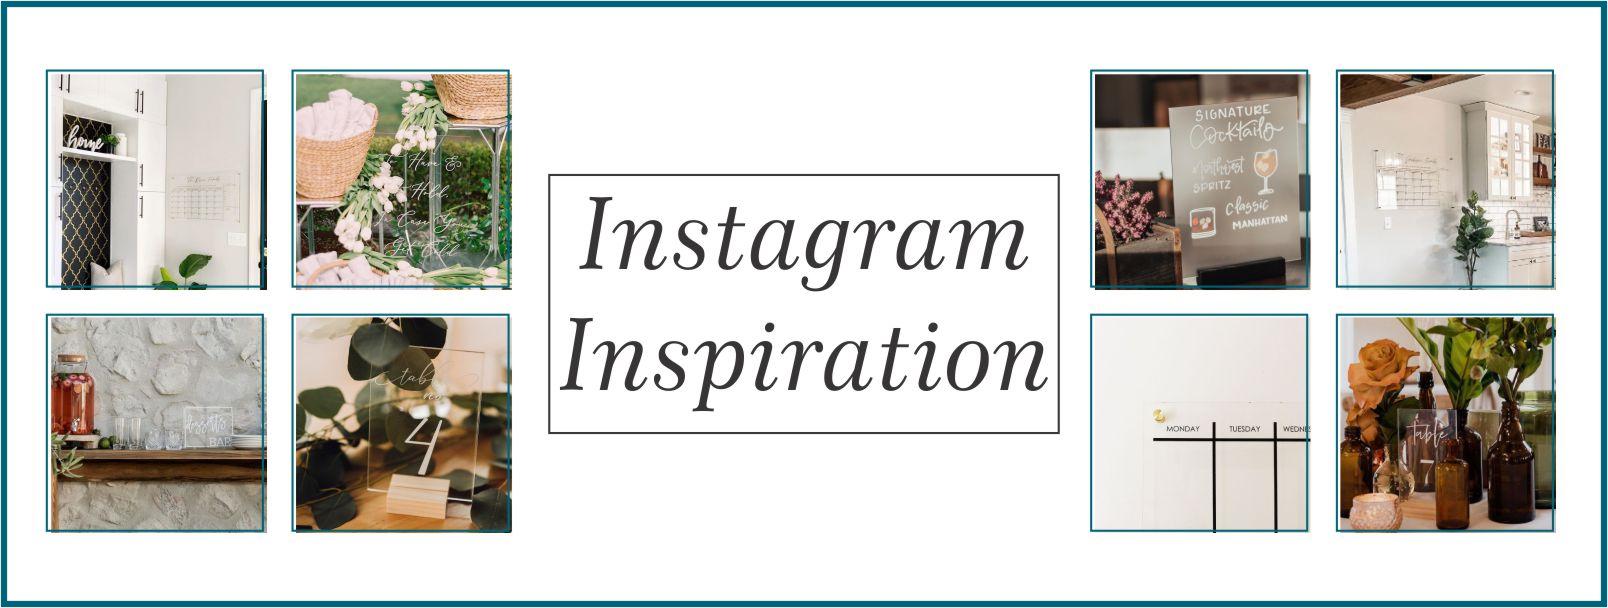 Instagram Inspiration Banner